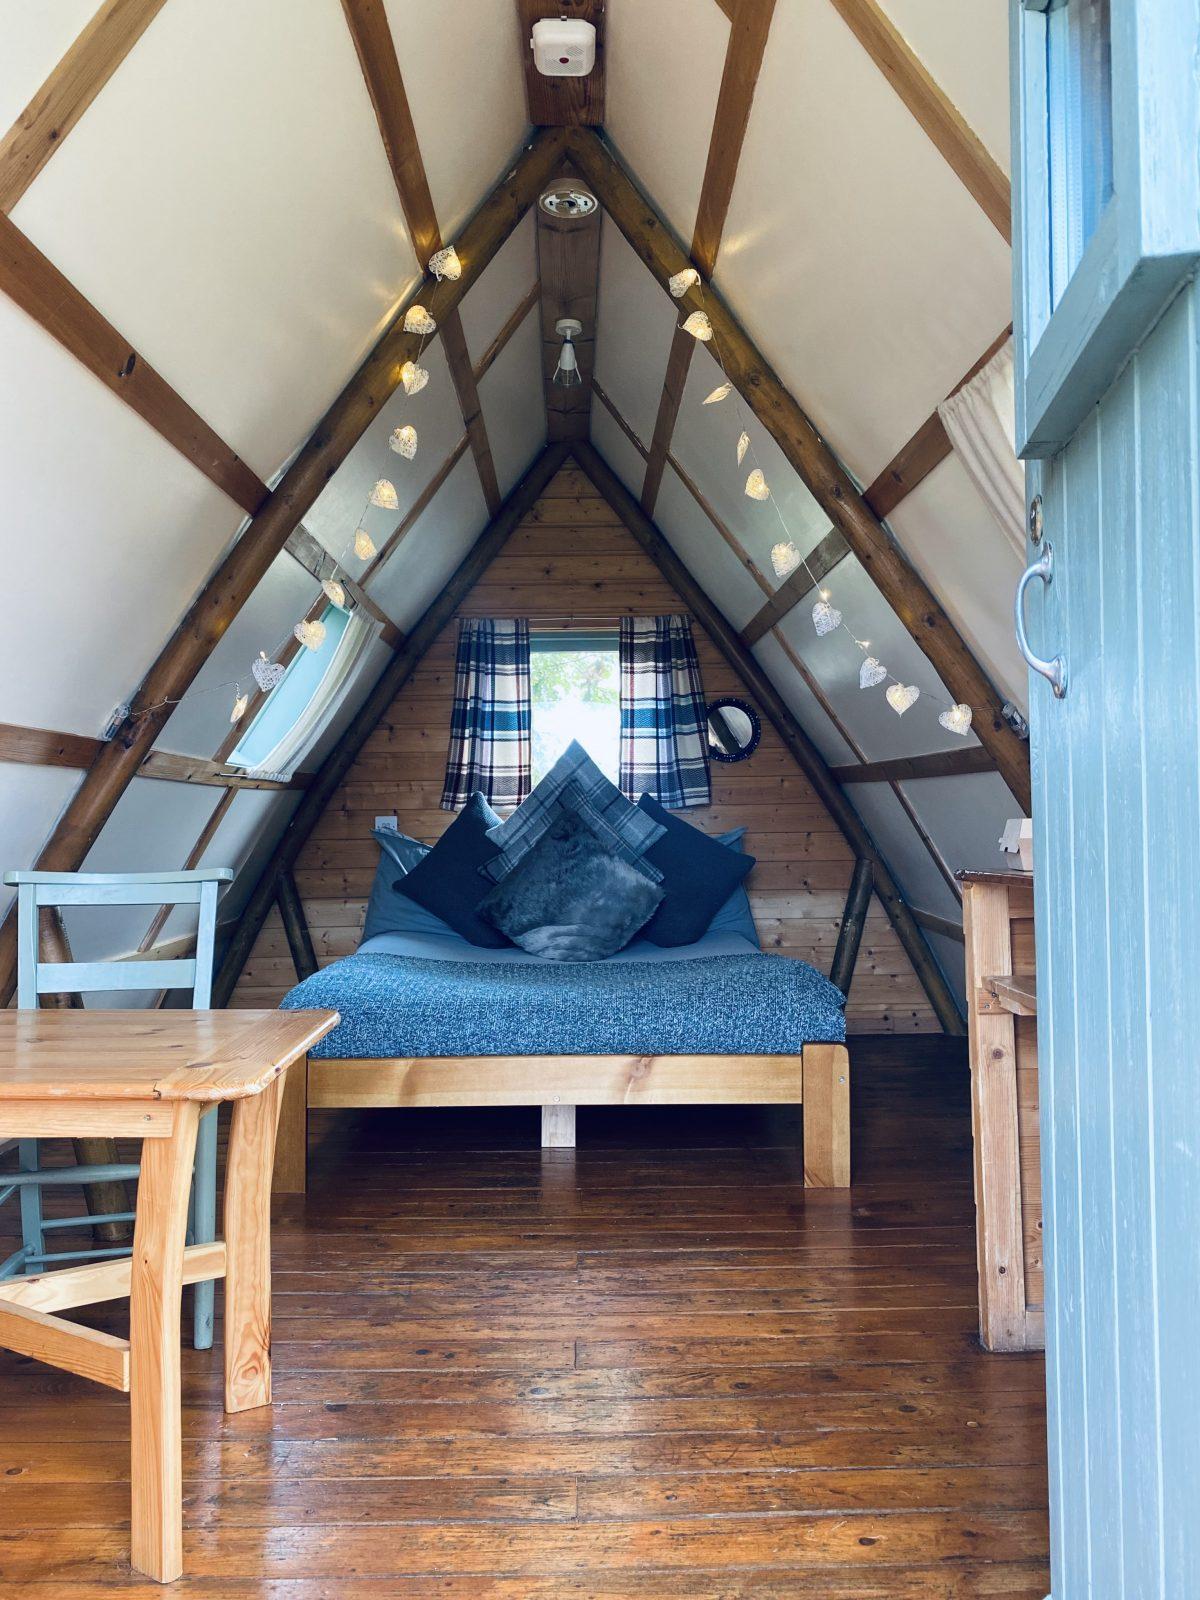 The Loft glamping cabin